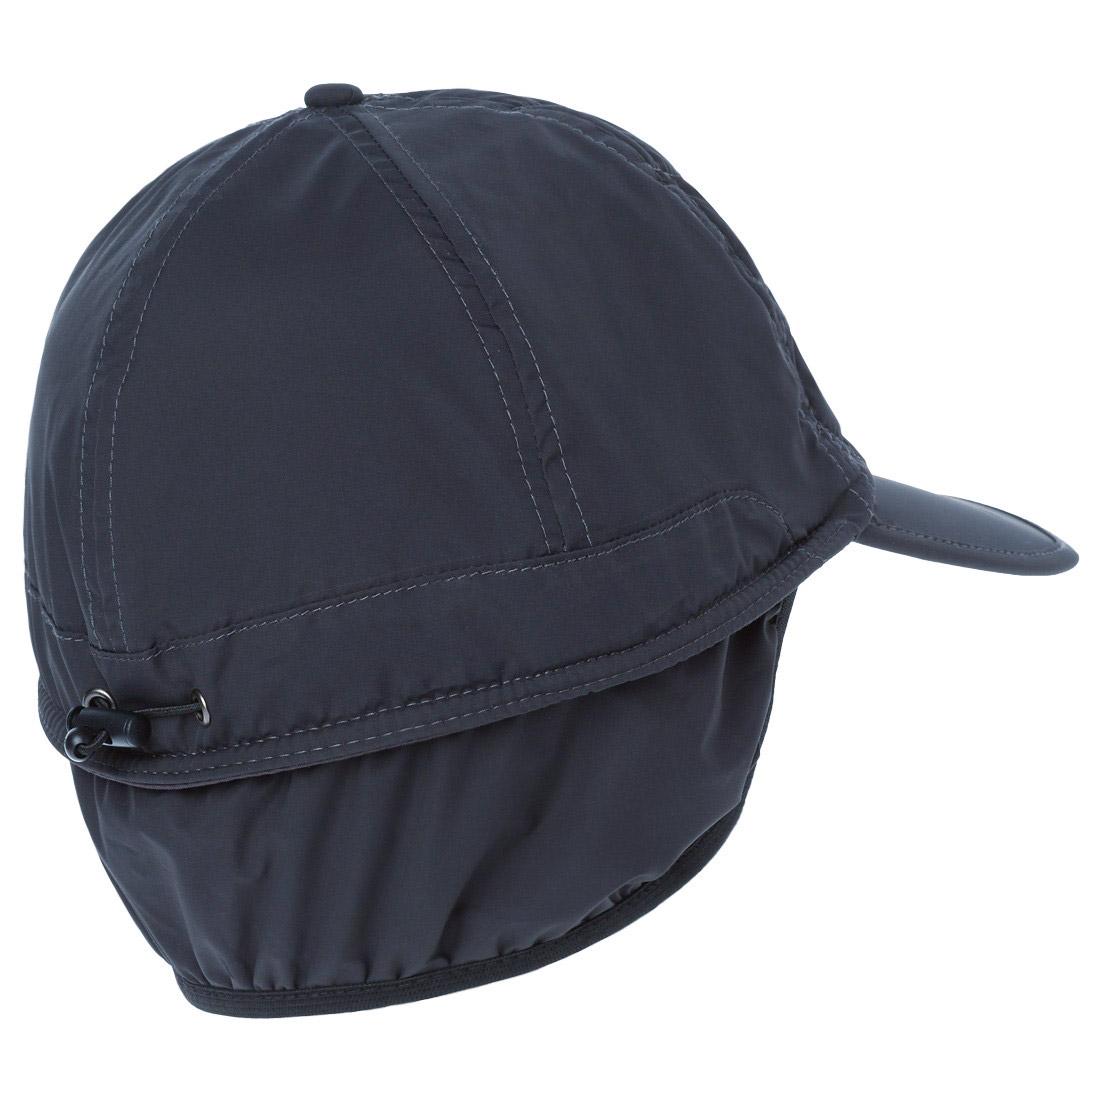 High Tech Herren Funktions-Golfcap mit Ohrenschutz